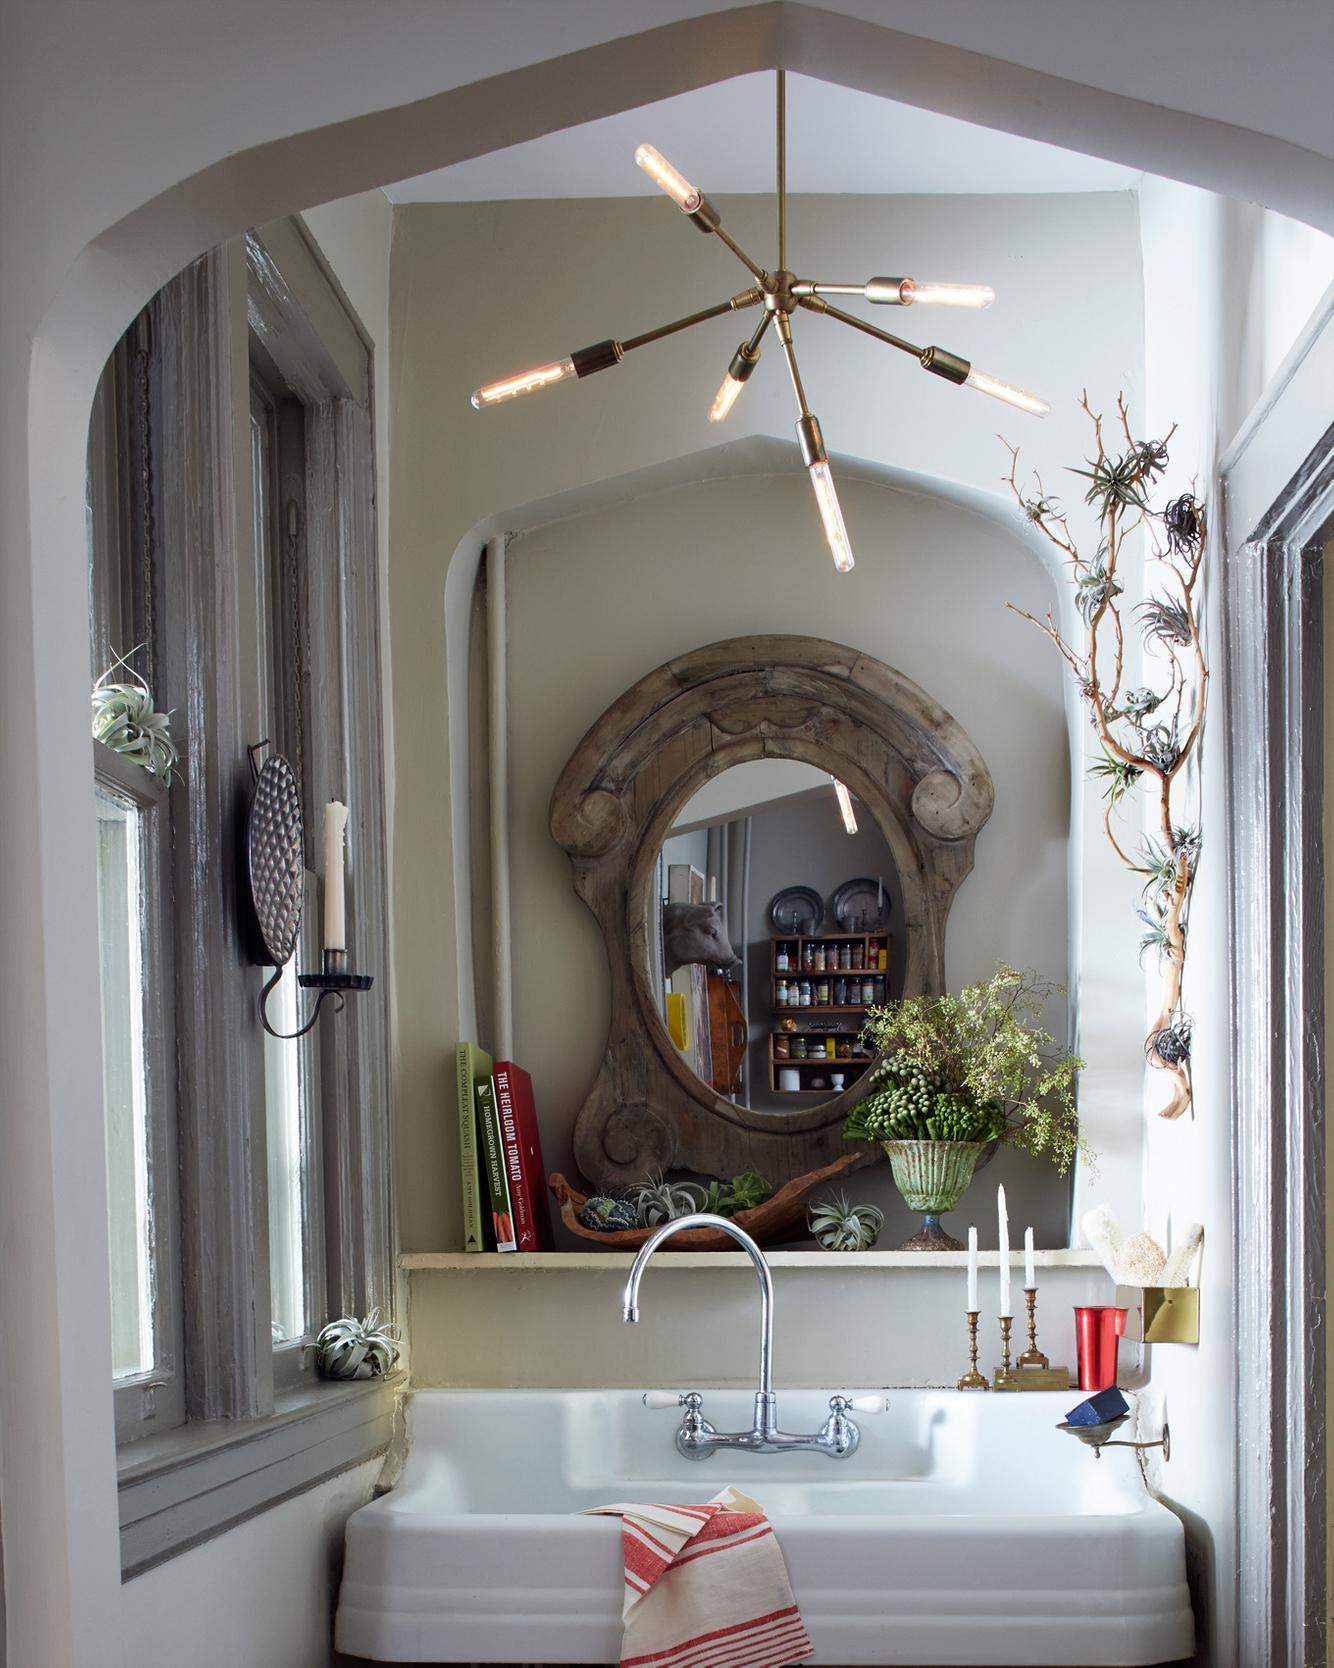 ChristopherWhite-kitchensink.jpg